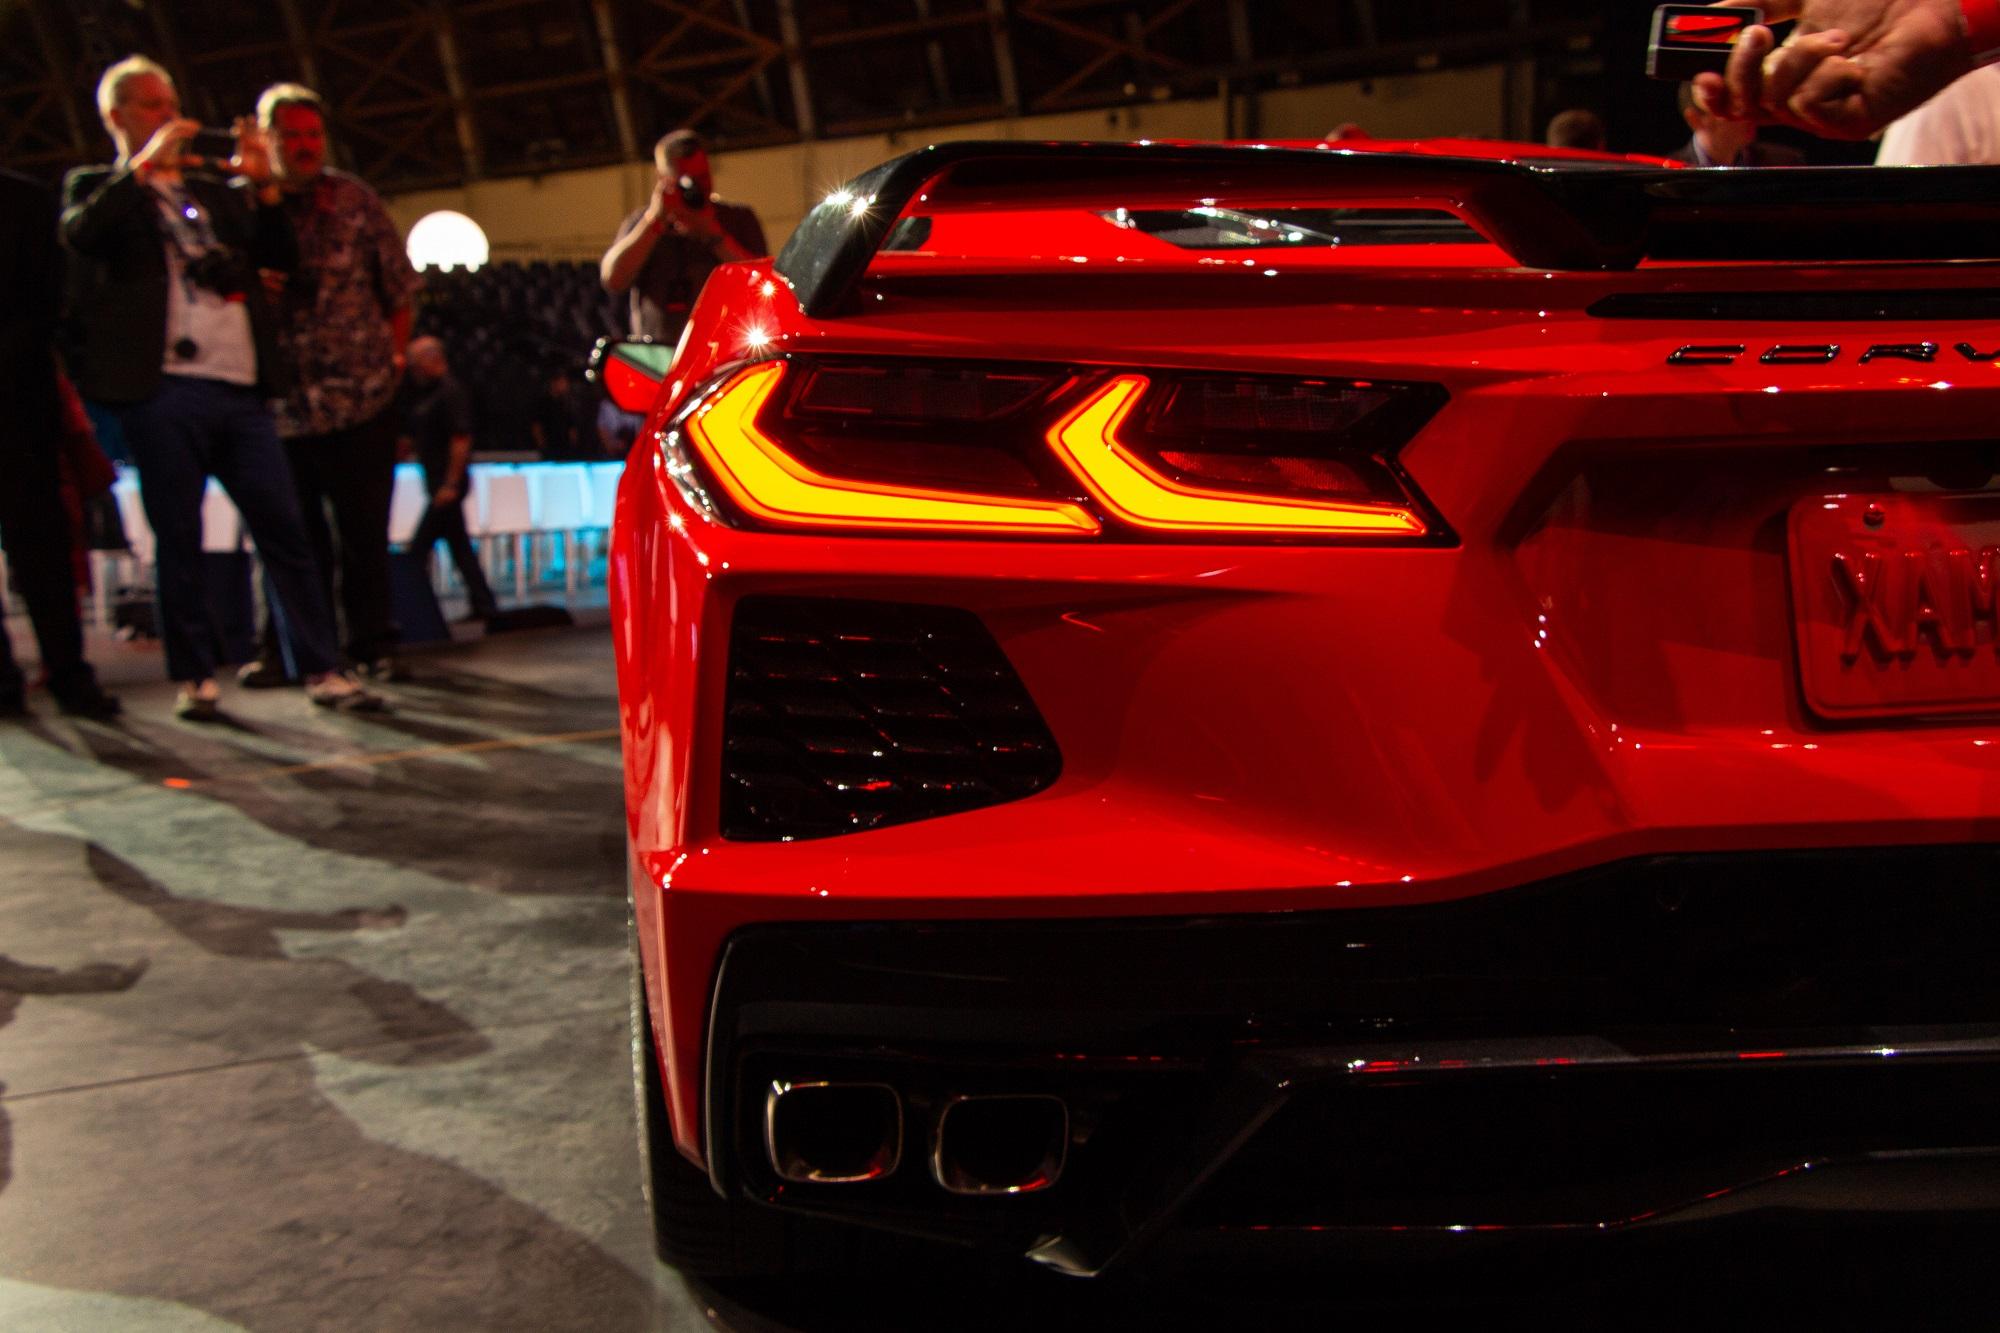 2020 C8 Corvette Exterior Colors Lights Stingray - CorvetteForum